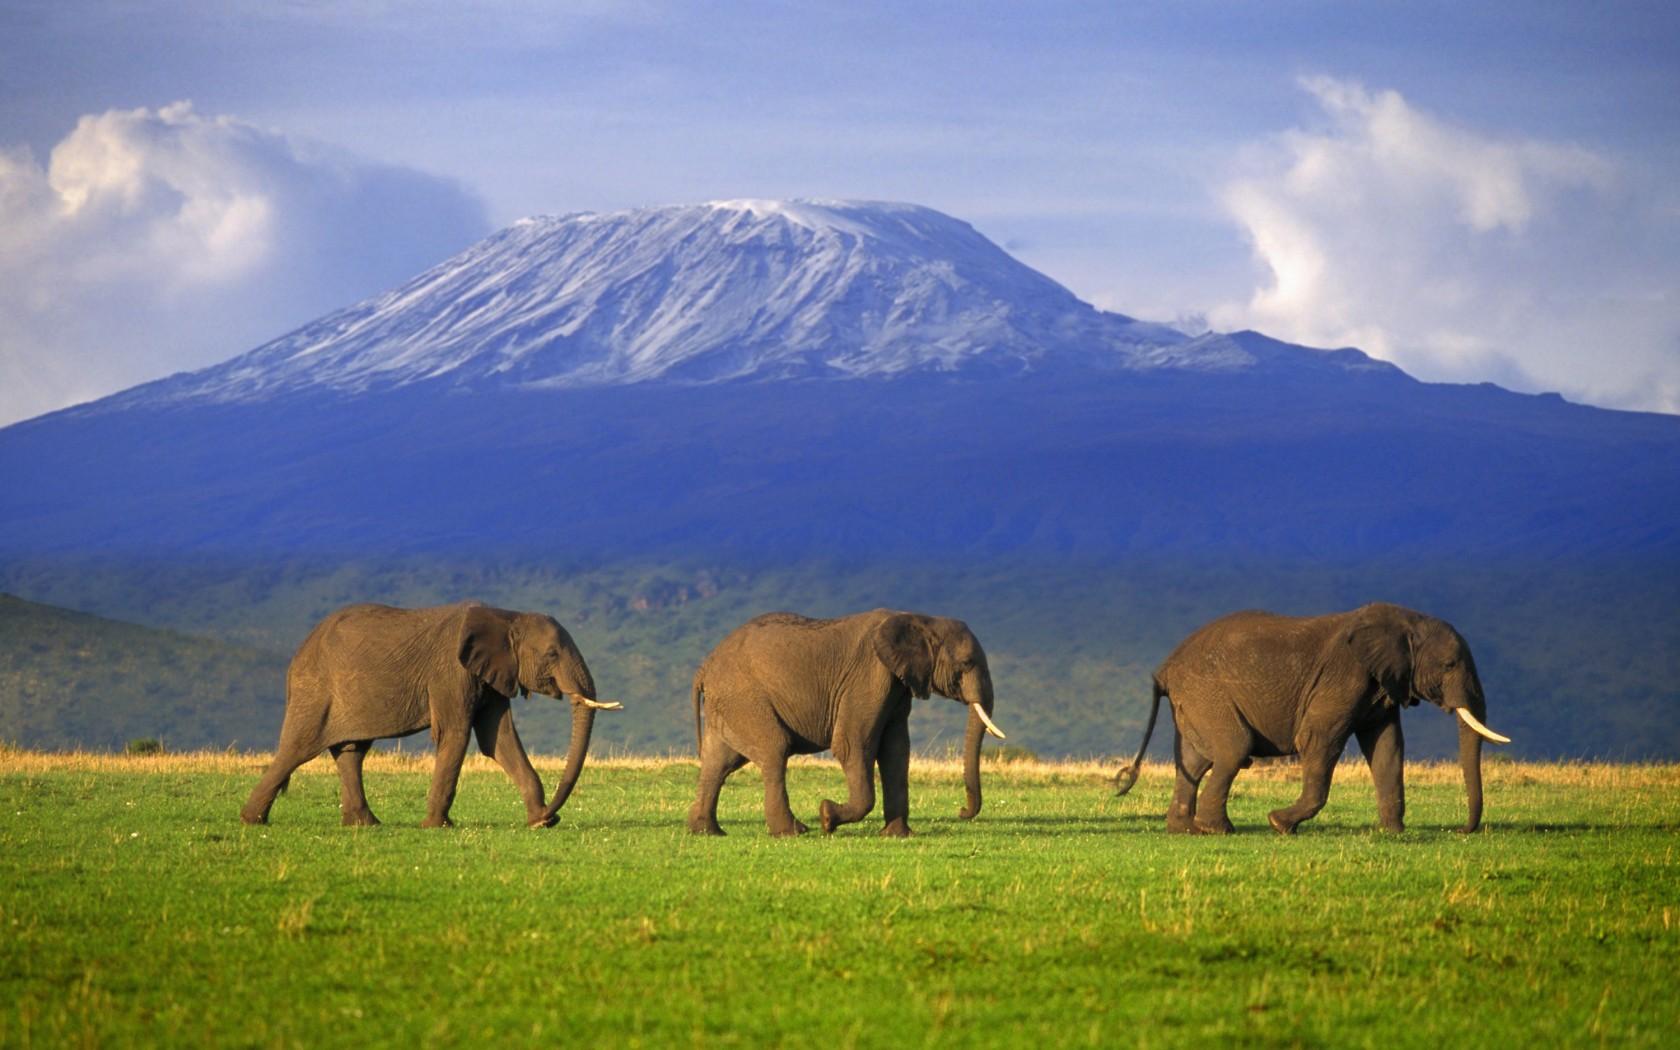 7Edited-Kilimanjaro-CSM106673-1680x1050